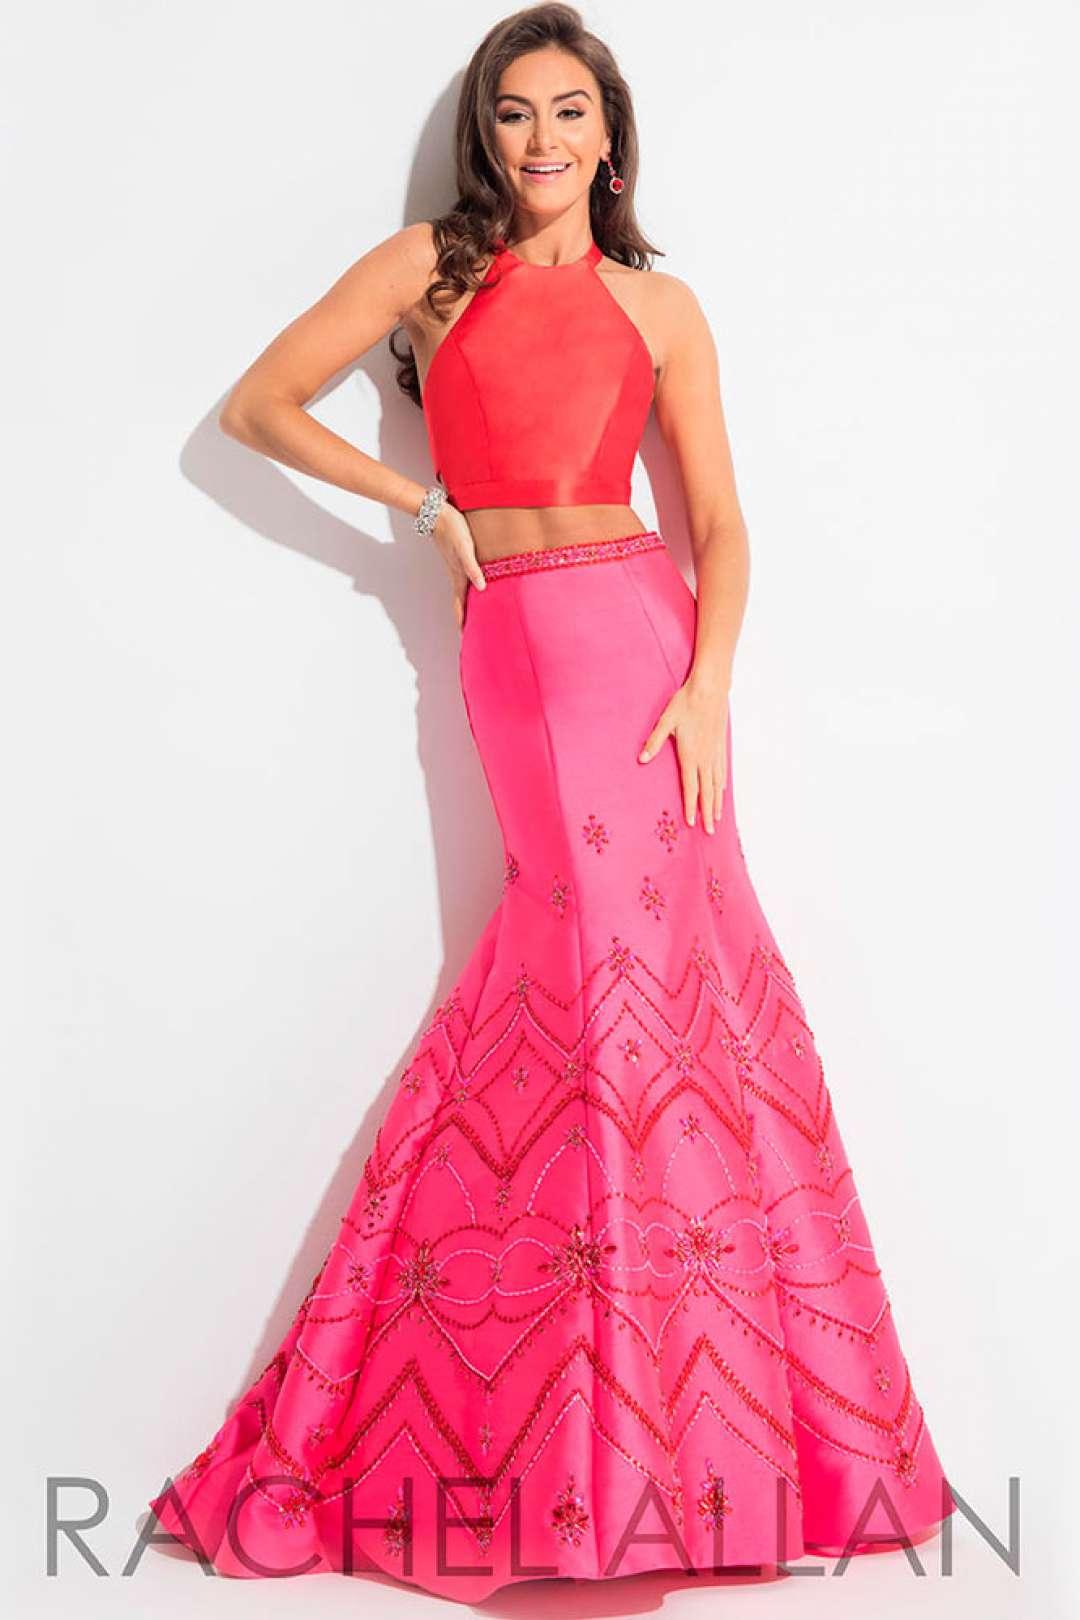 Asombroso Vestidos De Fiesta Descarado Cresta - Ideas de Estilos de ...